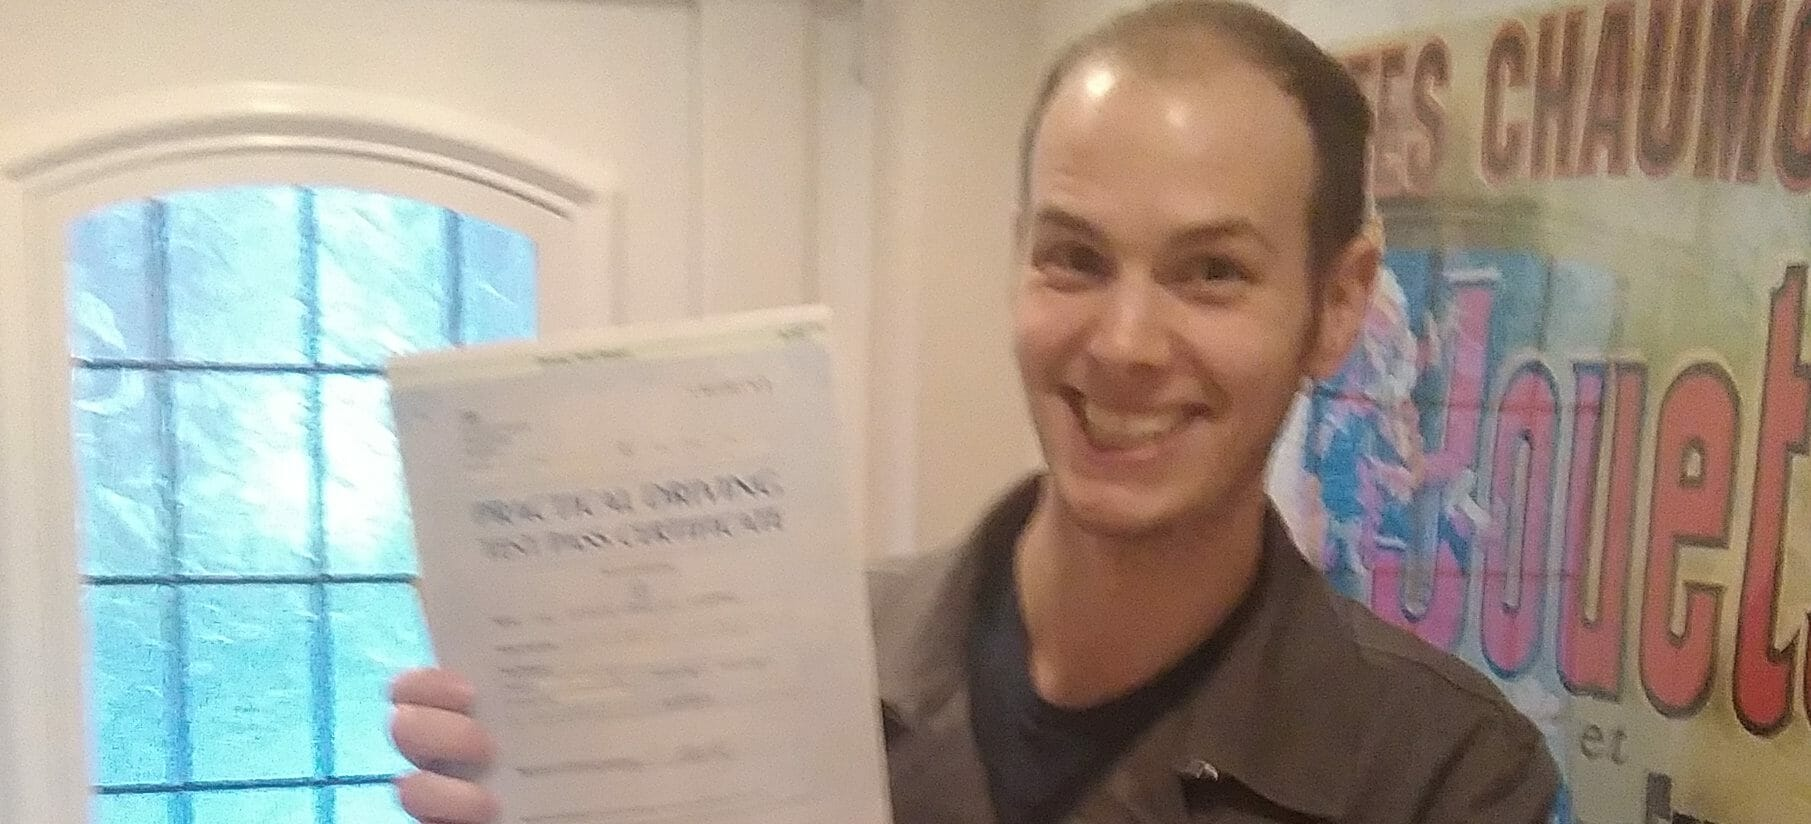 Congratulations to Nick in Littlehampton